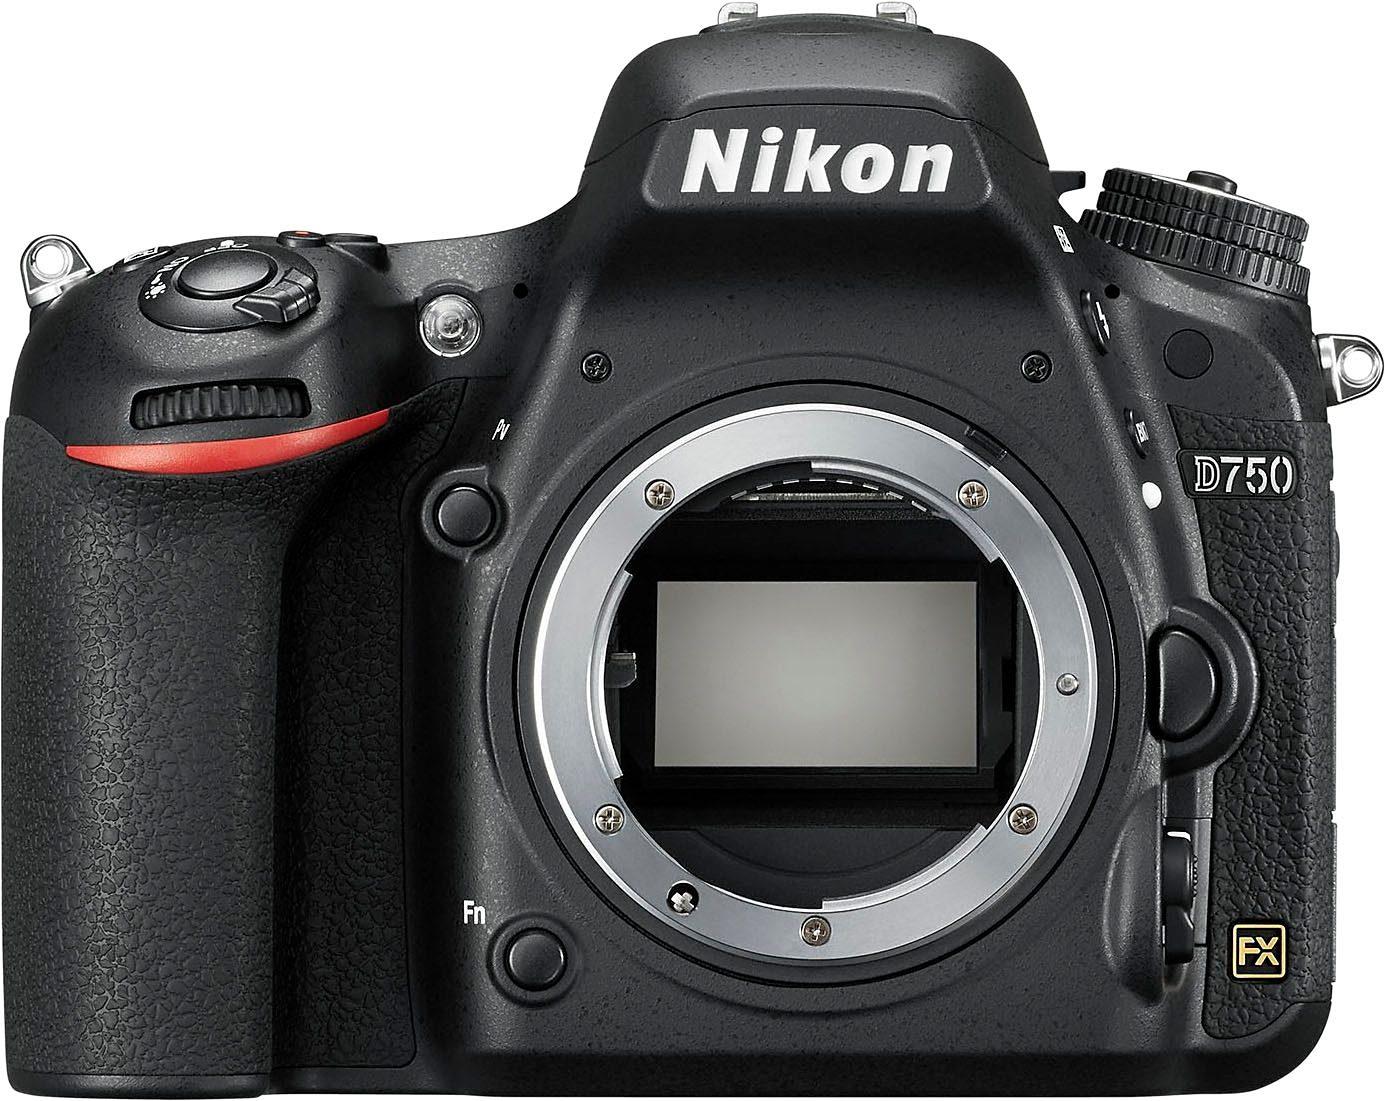 Nikon D750 Spiegelreflex Kamera, 24,3 Megapixel, 8 cm (3,2 Zoll) Display